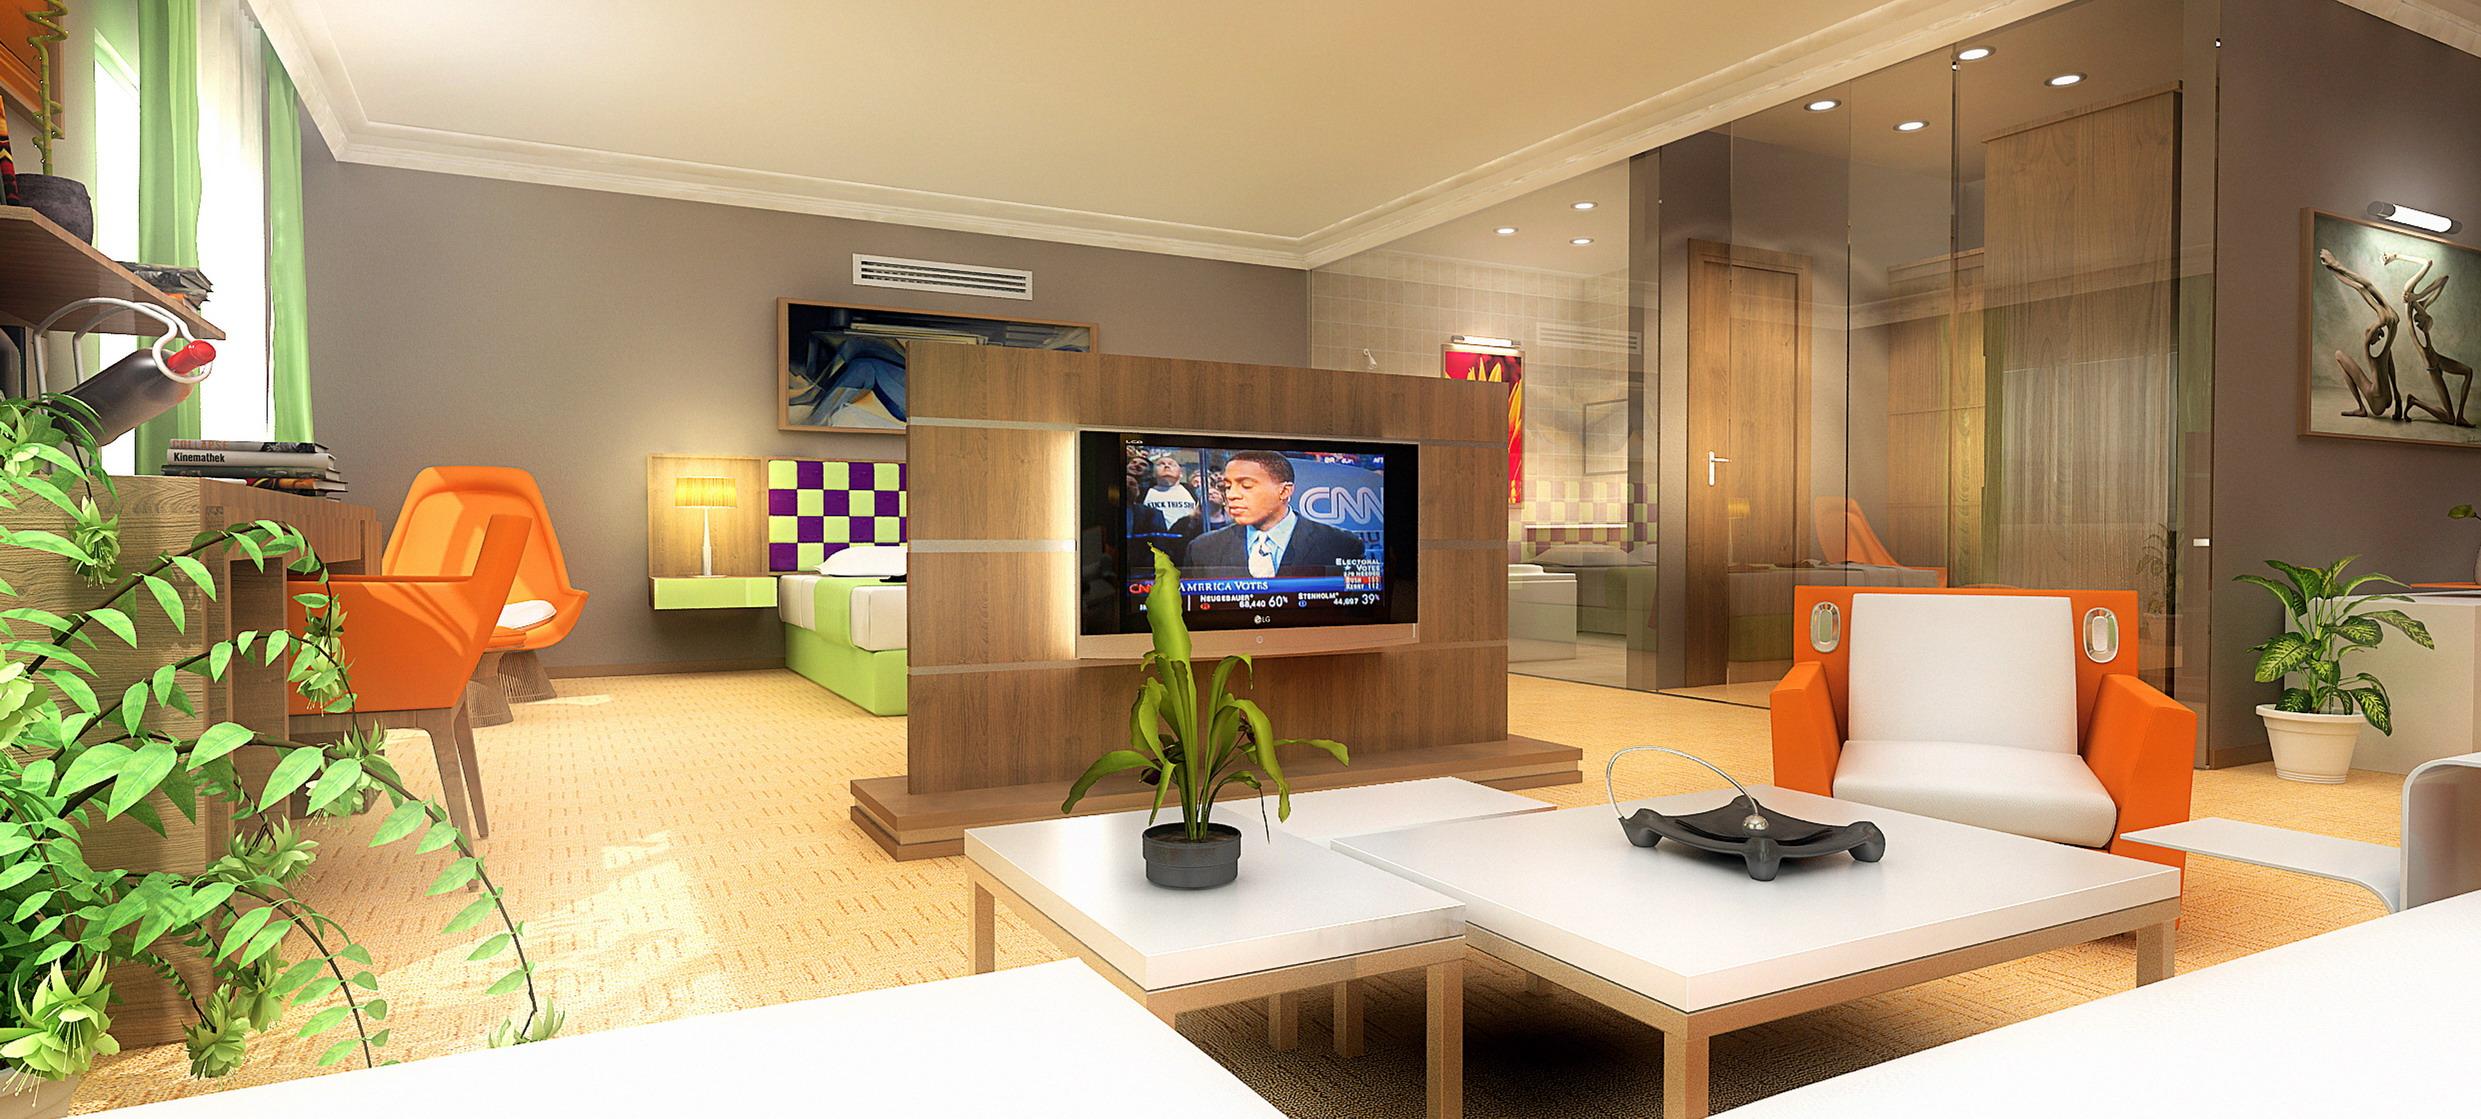 3D hotel room rendering